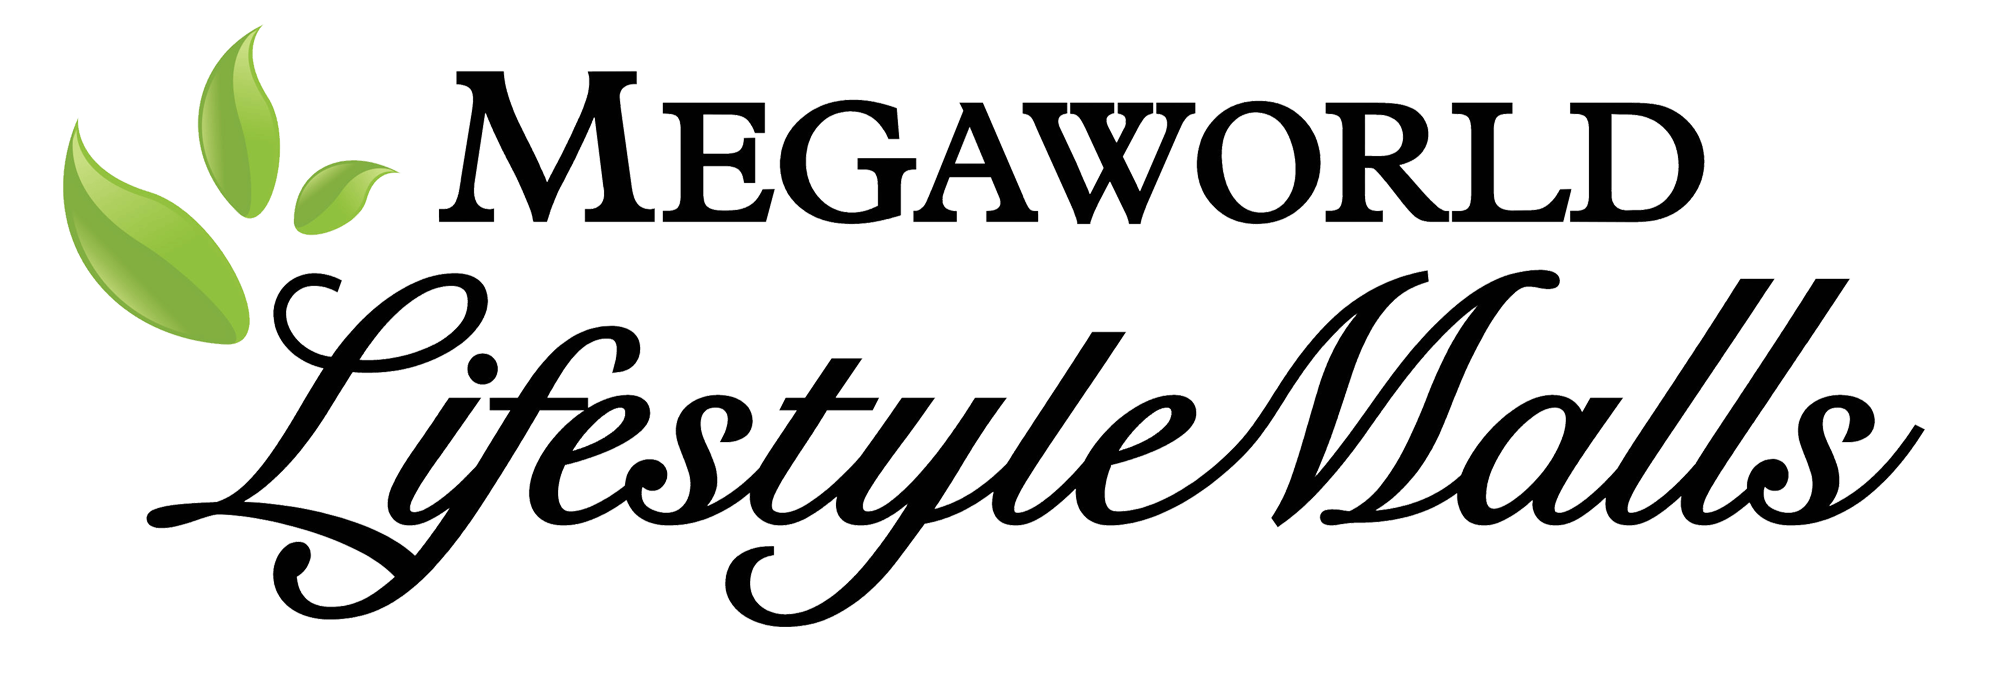 Megaworld_Lifestyle_Malls_Logo.png